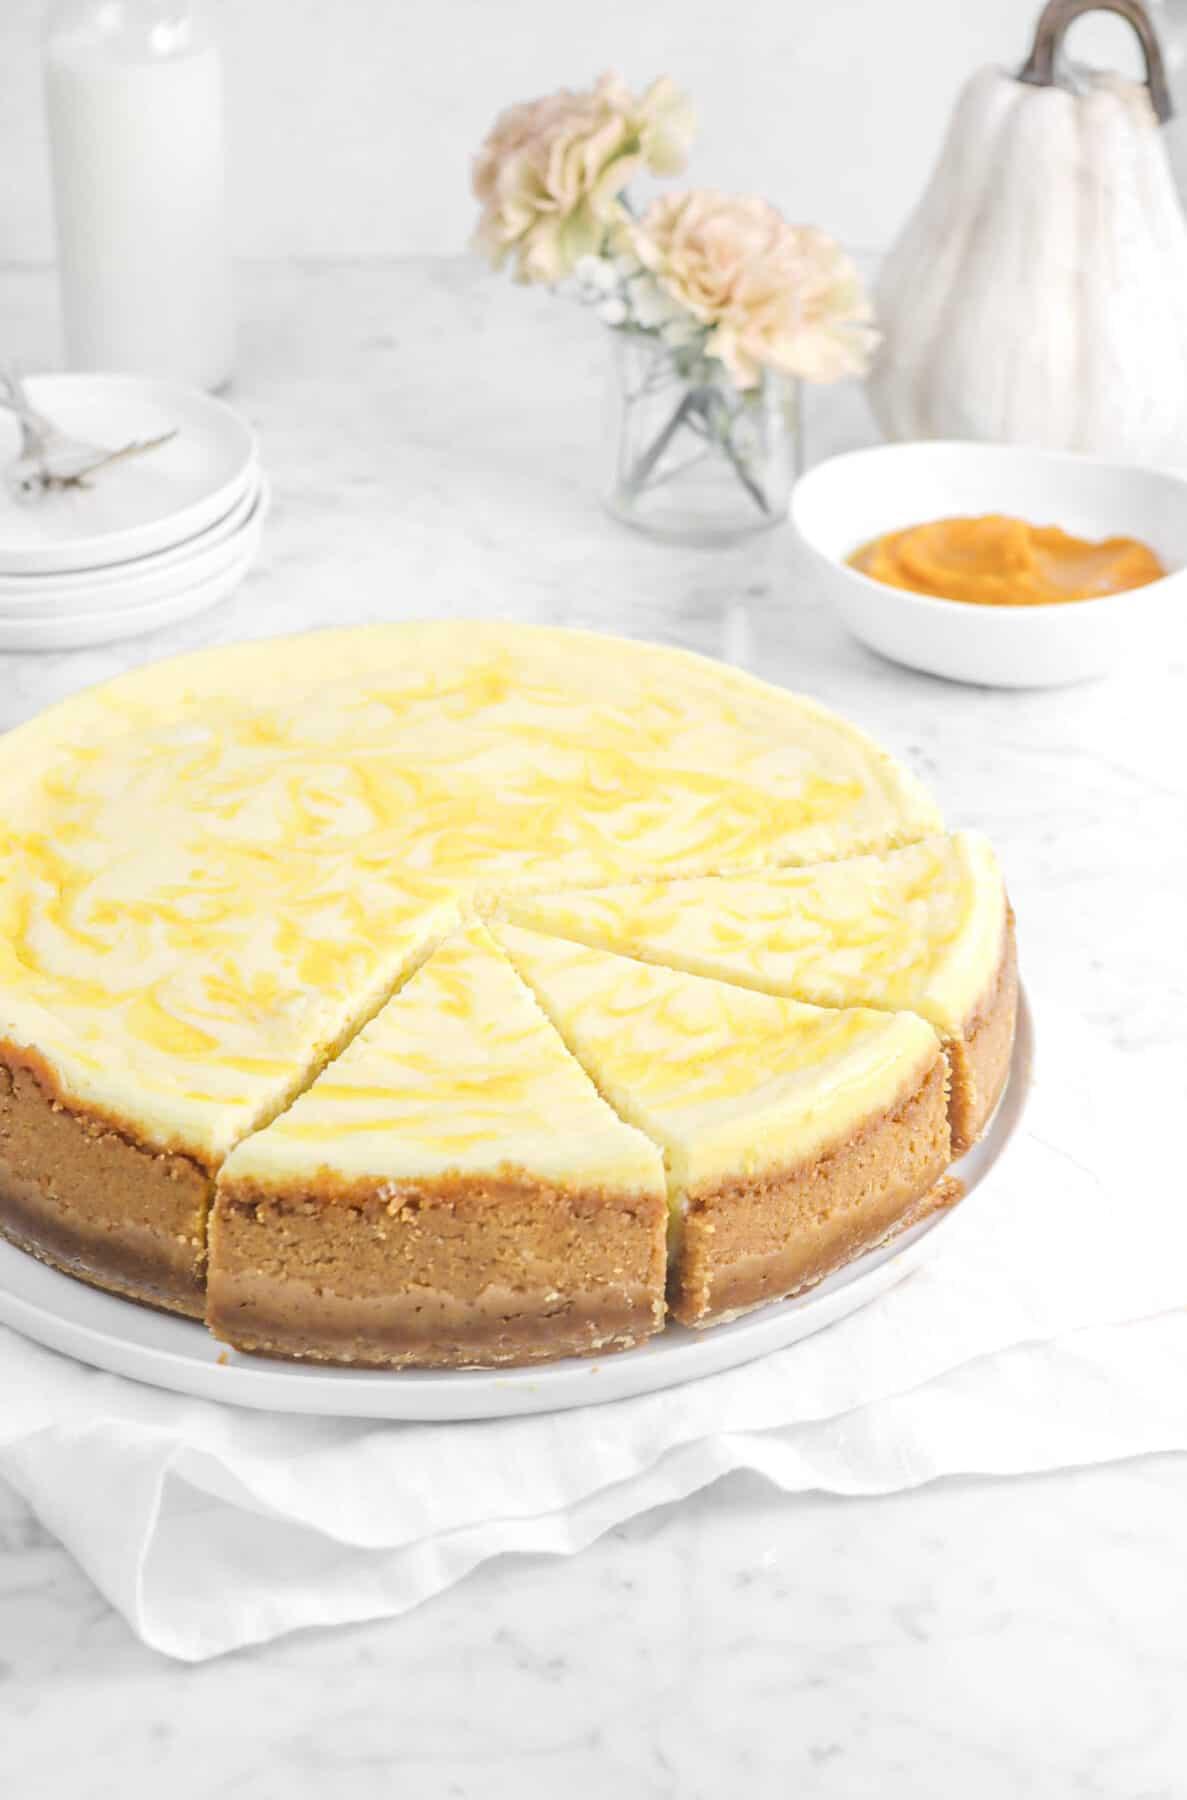 pumpkin swirl cheesecake with three slices